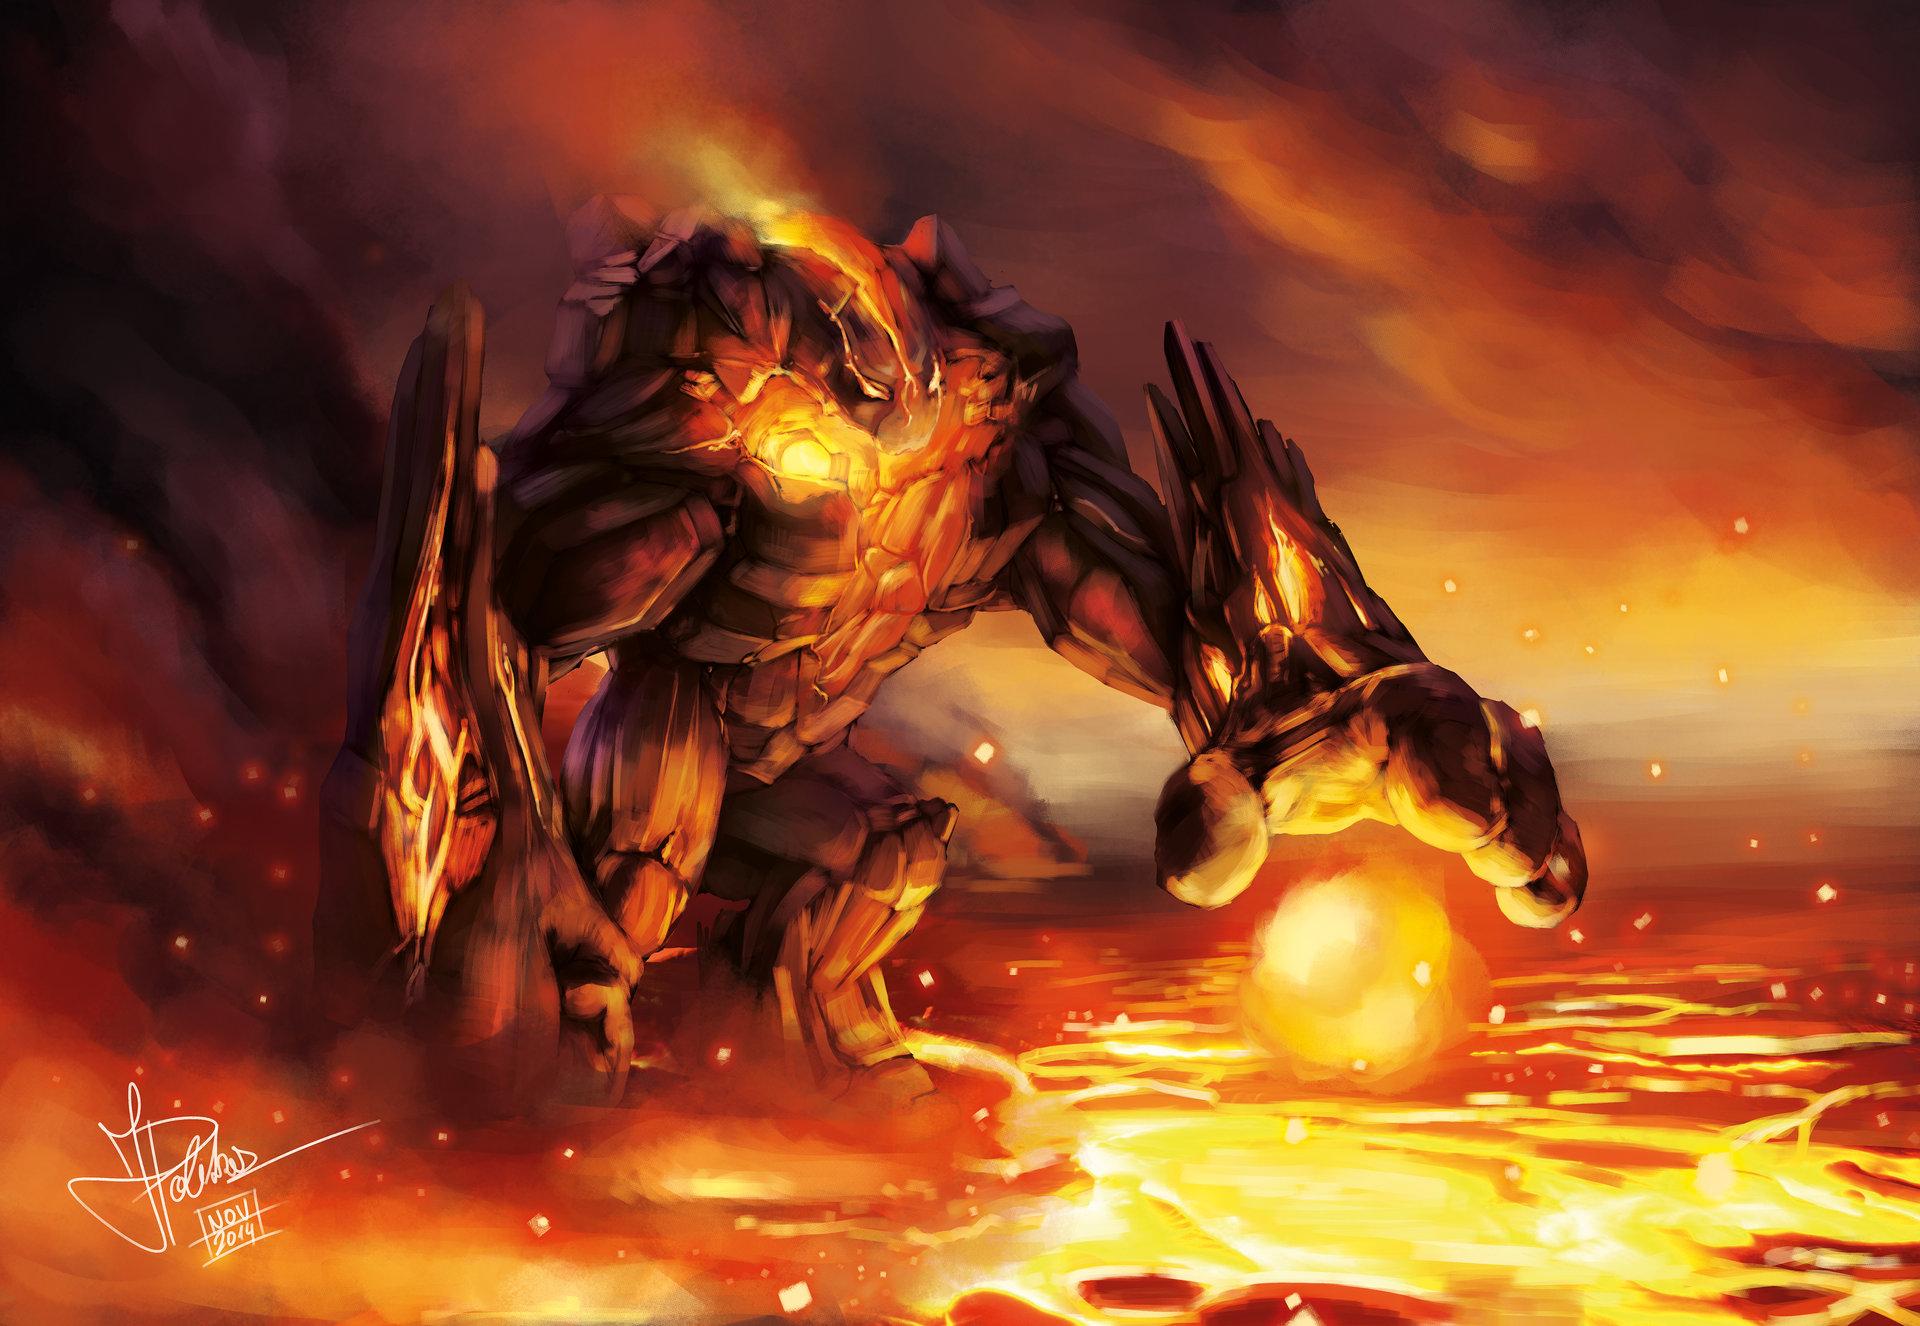 jakub-politzer-fire-elemental-jakup-politzer.jpg